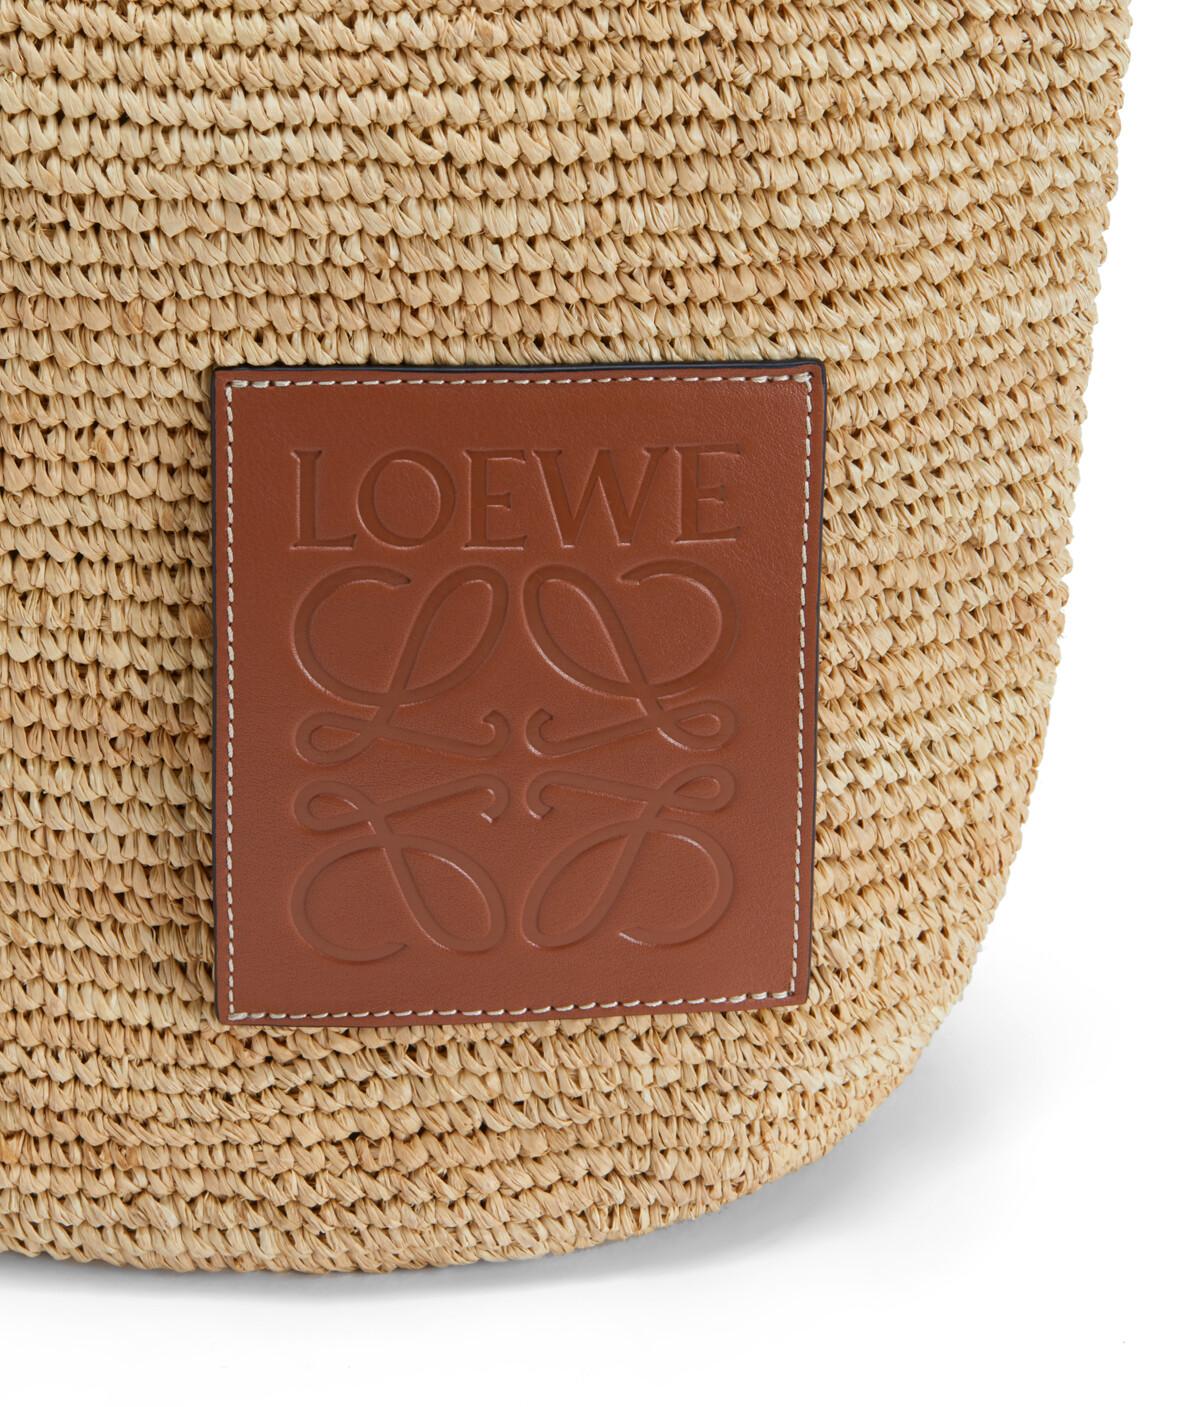 LOEWE Slit Bag In Raffia And Calfskin Natural front